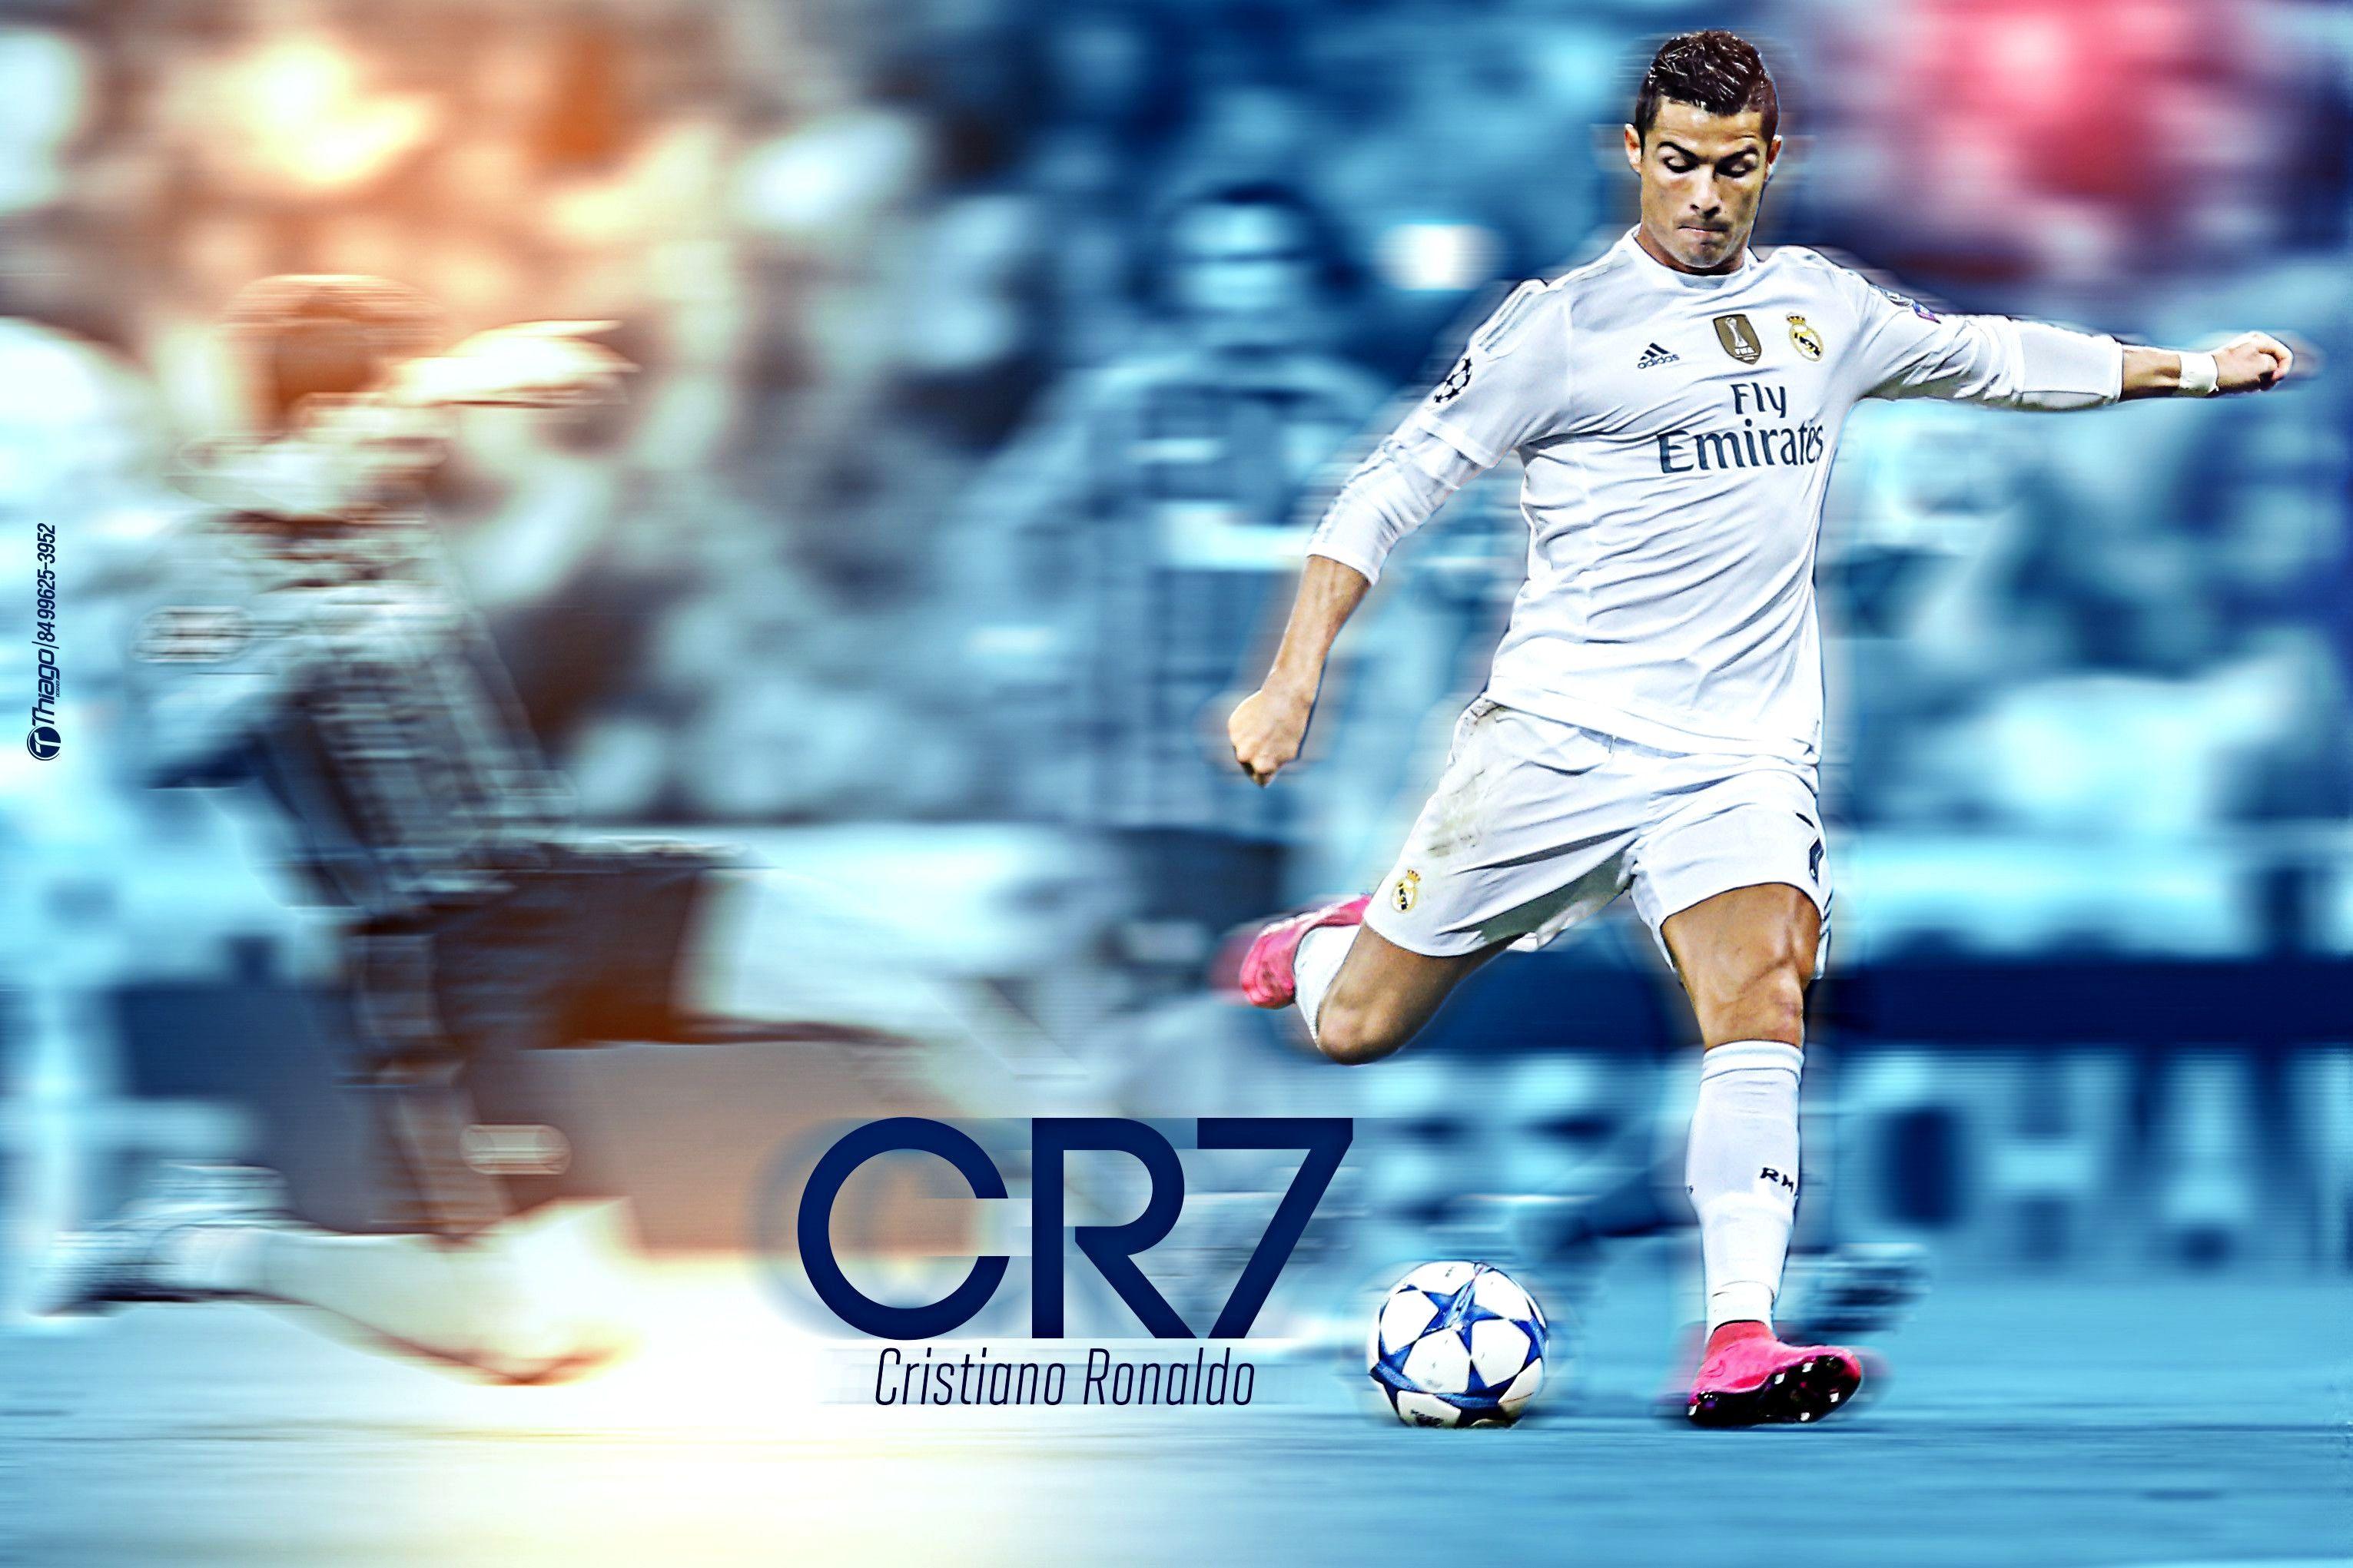 Wallpaper 4k Cristiano Ronaldo Gallery Ronaldo Cristiano Ronaldo Cristiano Ronaldo Wallpapers